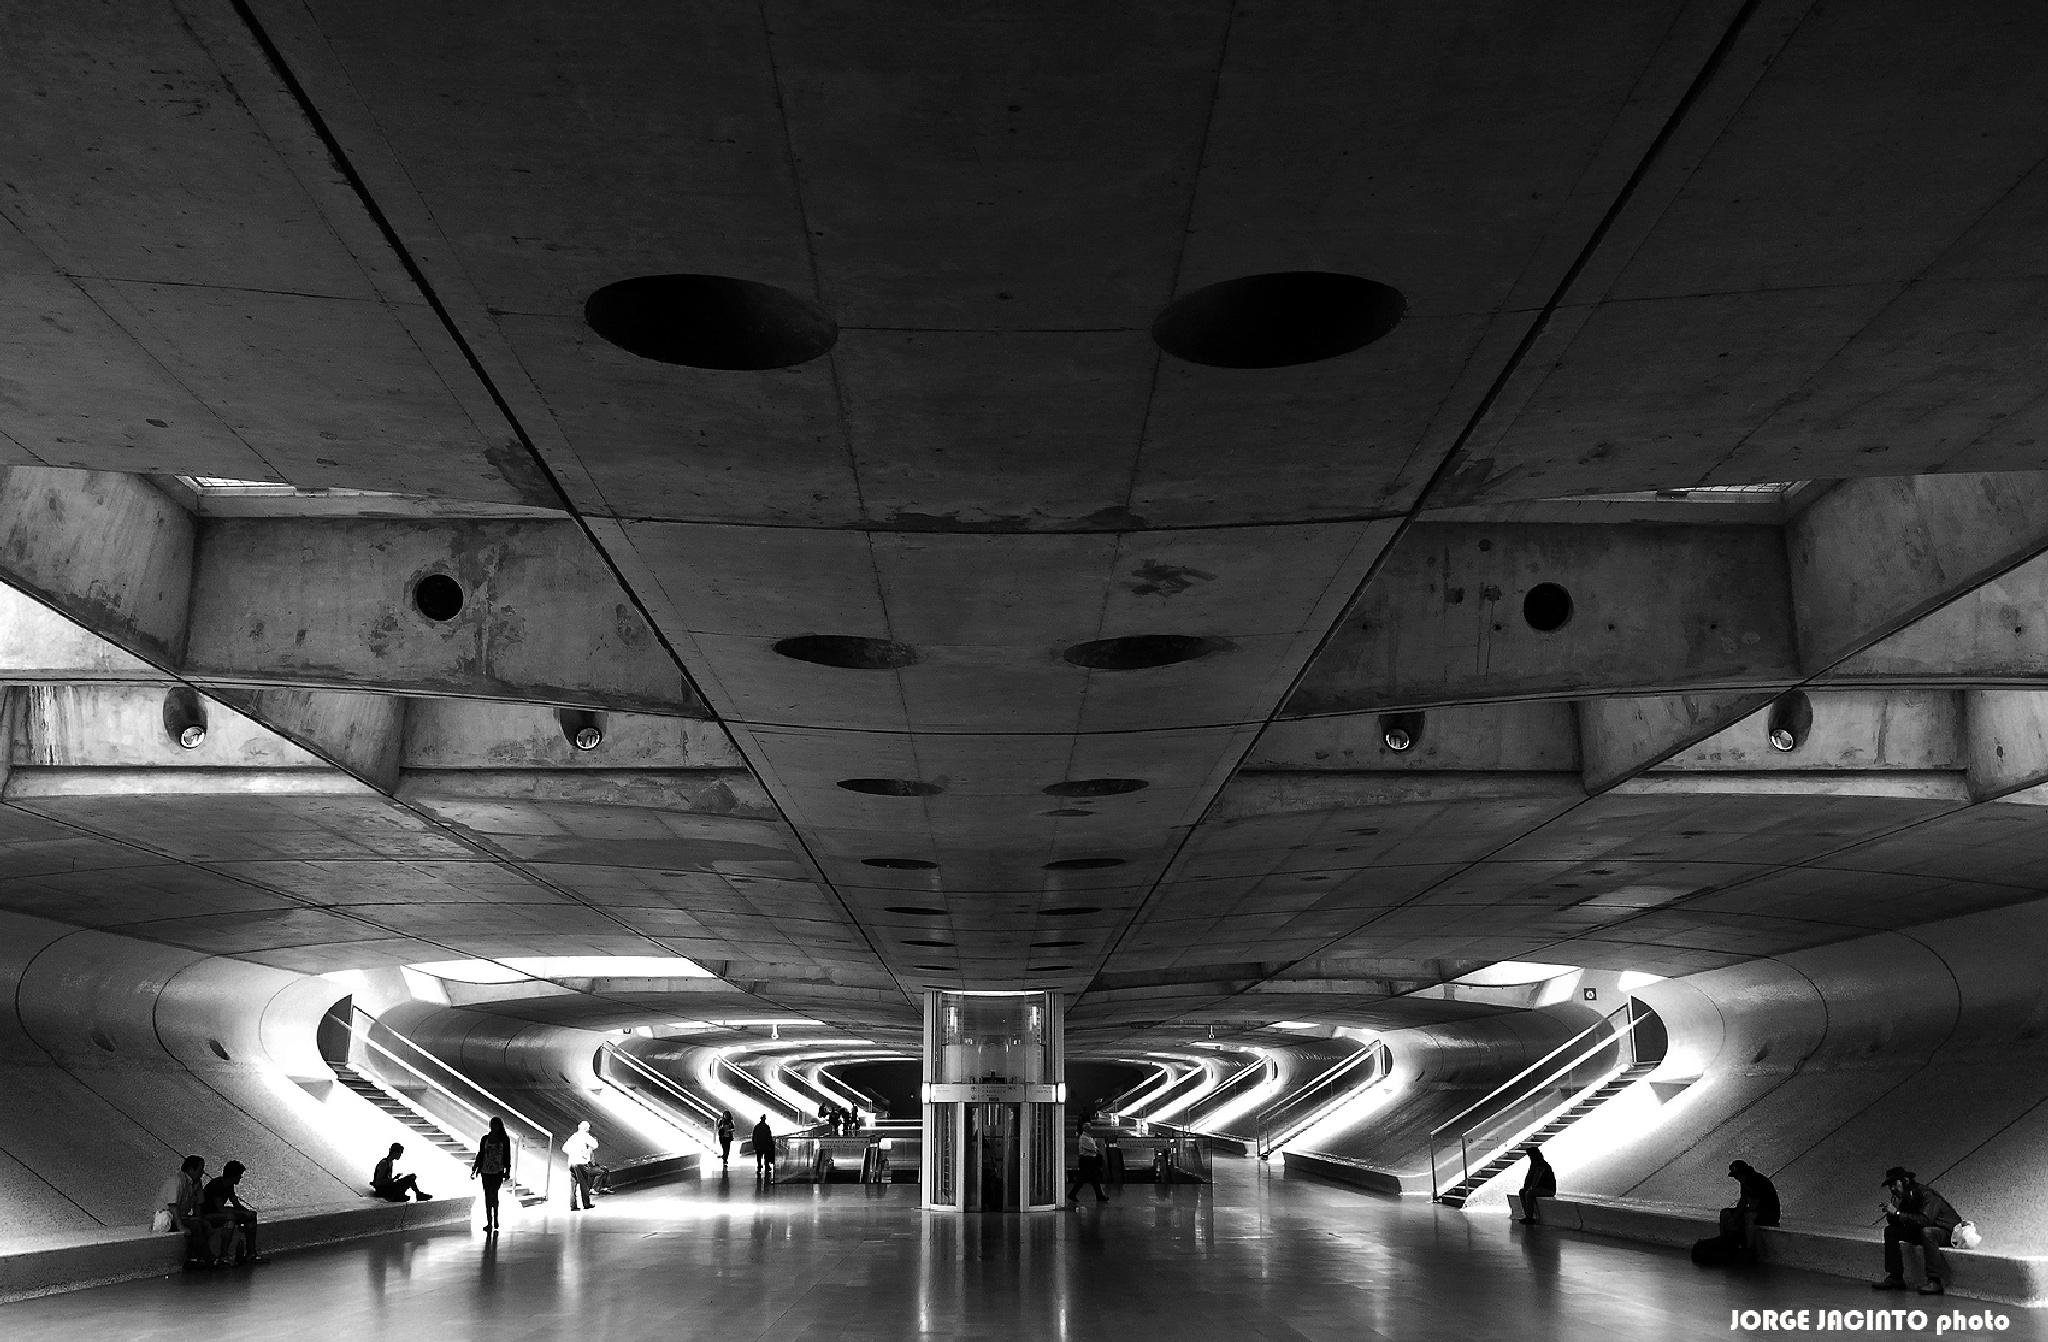 ORIENTE STATION by jorgejacinto14